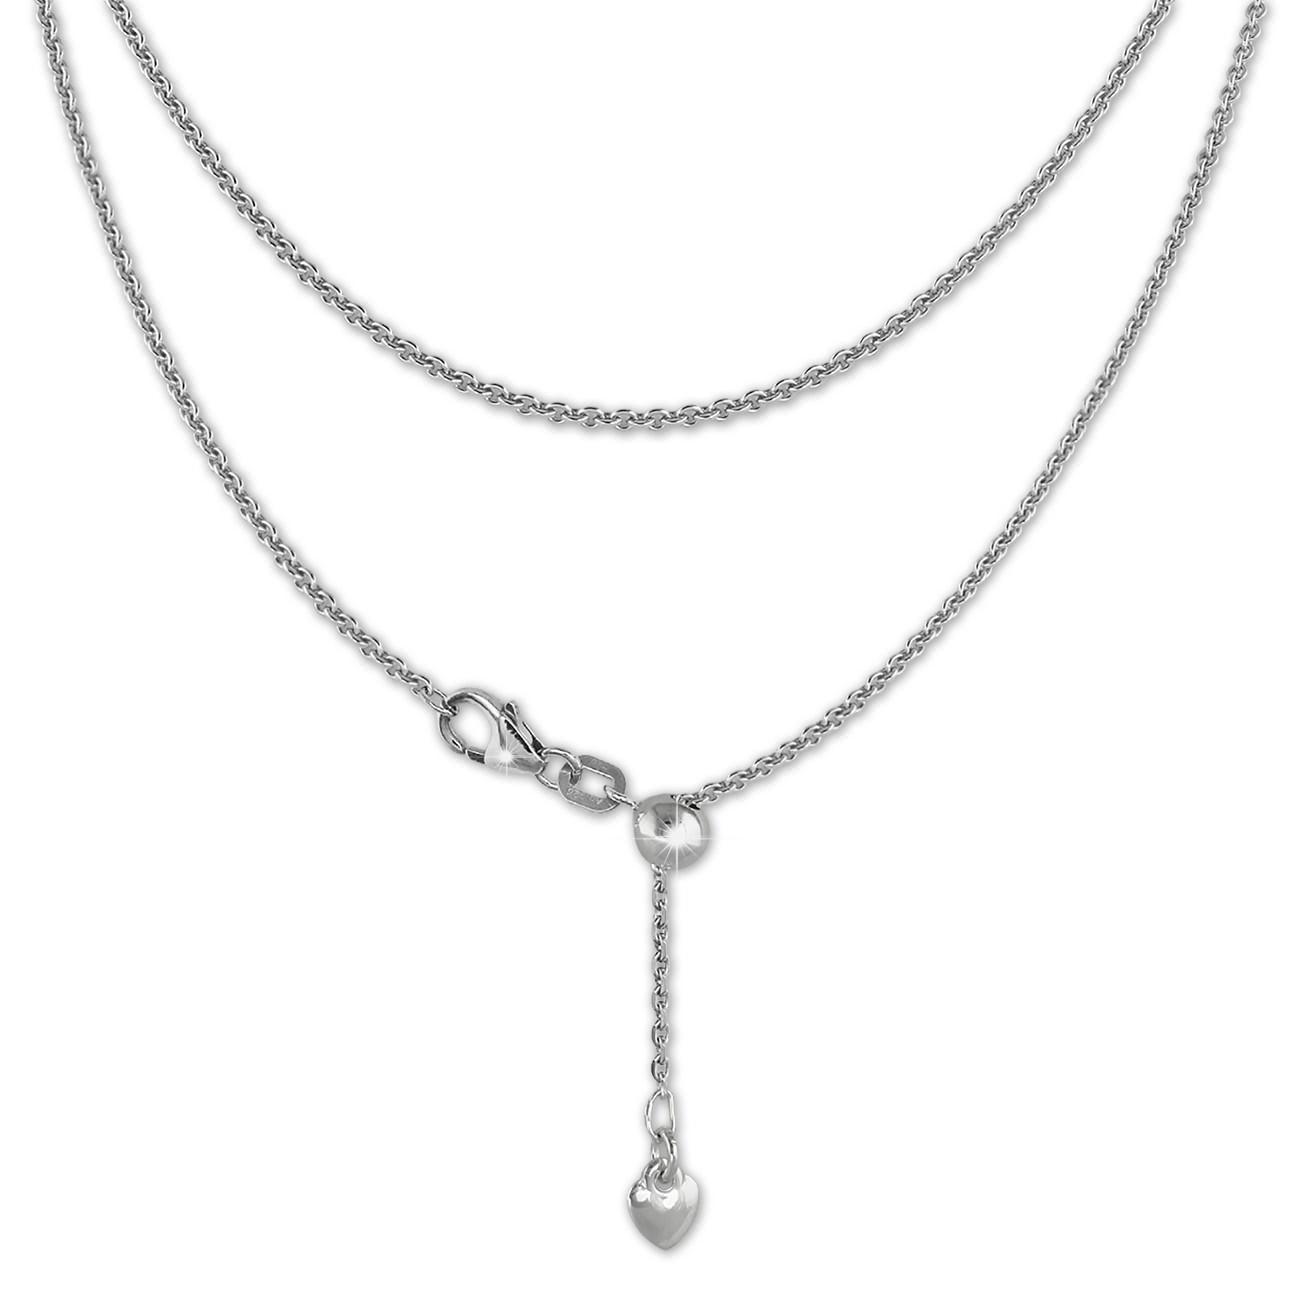 SilberDream Collier Kette Herz 925er Sterling Silber Damen 45cm SDK22645J